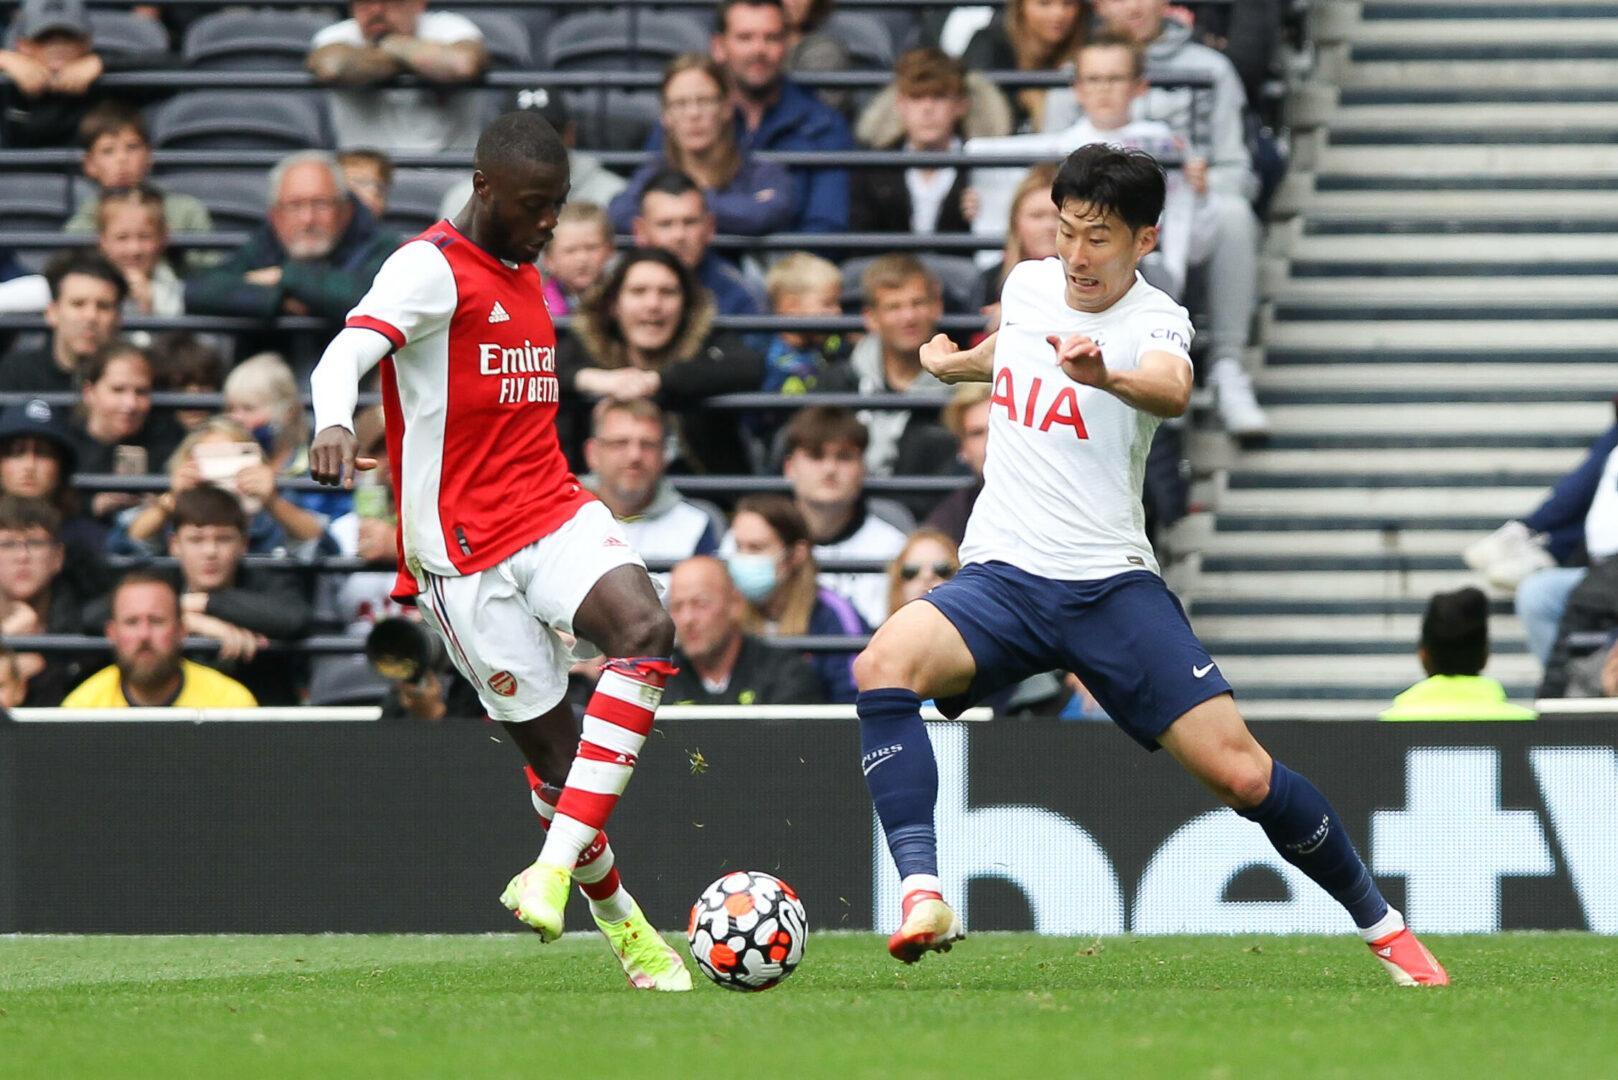 Pépé (Arsenal), Son (Tottenham) im Zweikampf